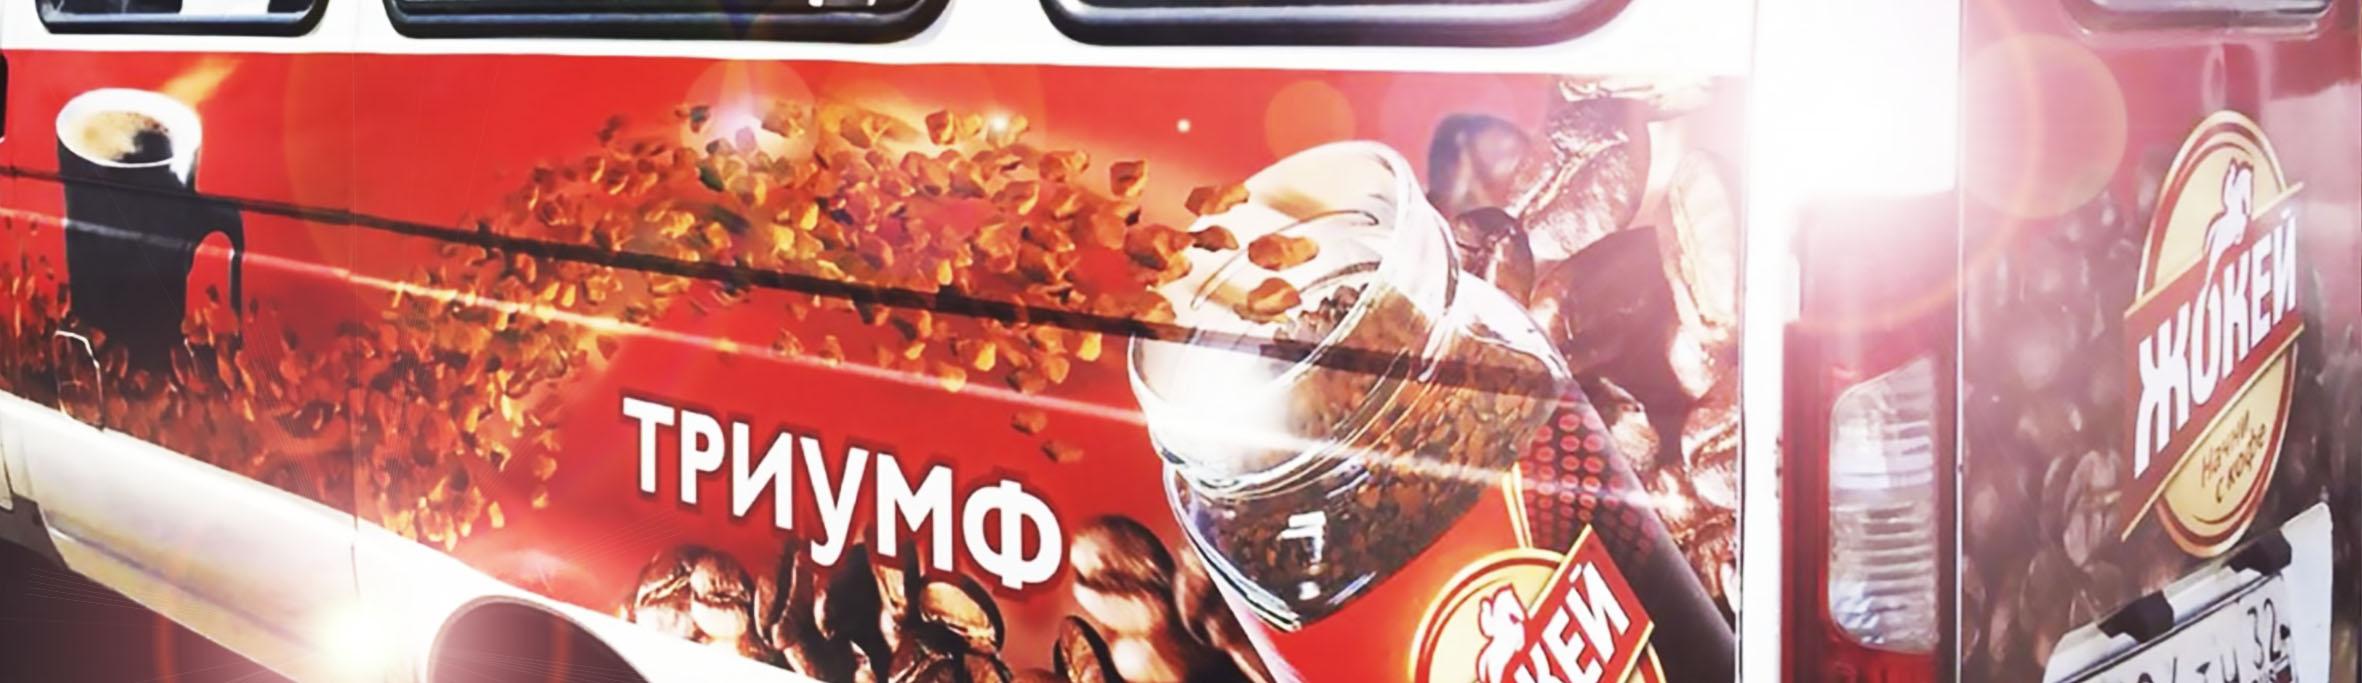 Реклама на транспорте в Черкесске размещение